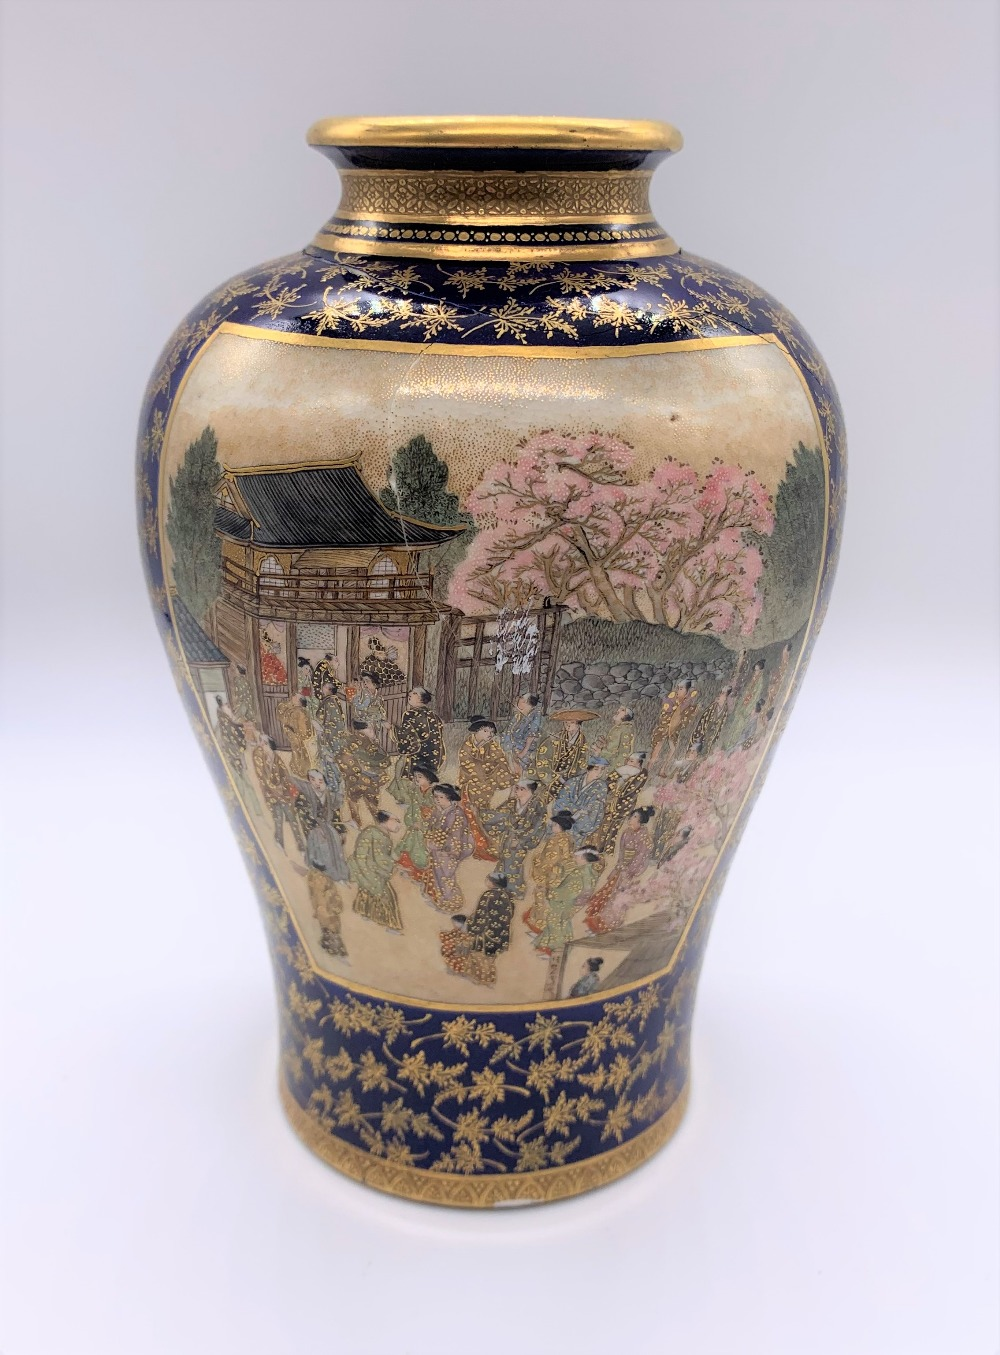 KEIZAN FOR KINKOZAN; a Japanese Meiji period Satsuma vase decorated with twin landscape panels - Image 4 of 7